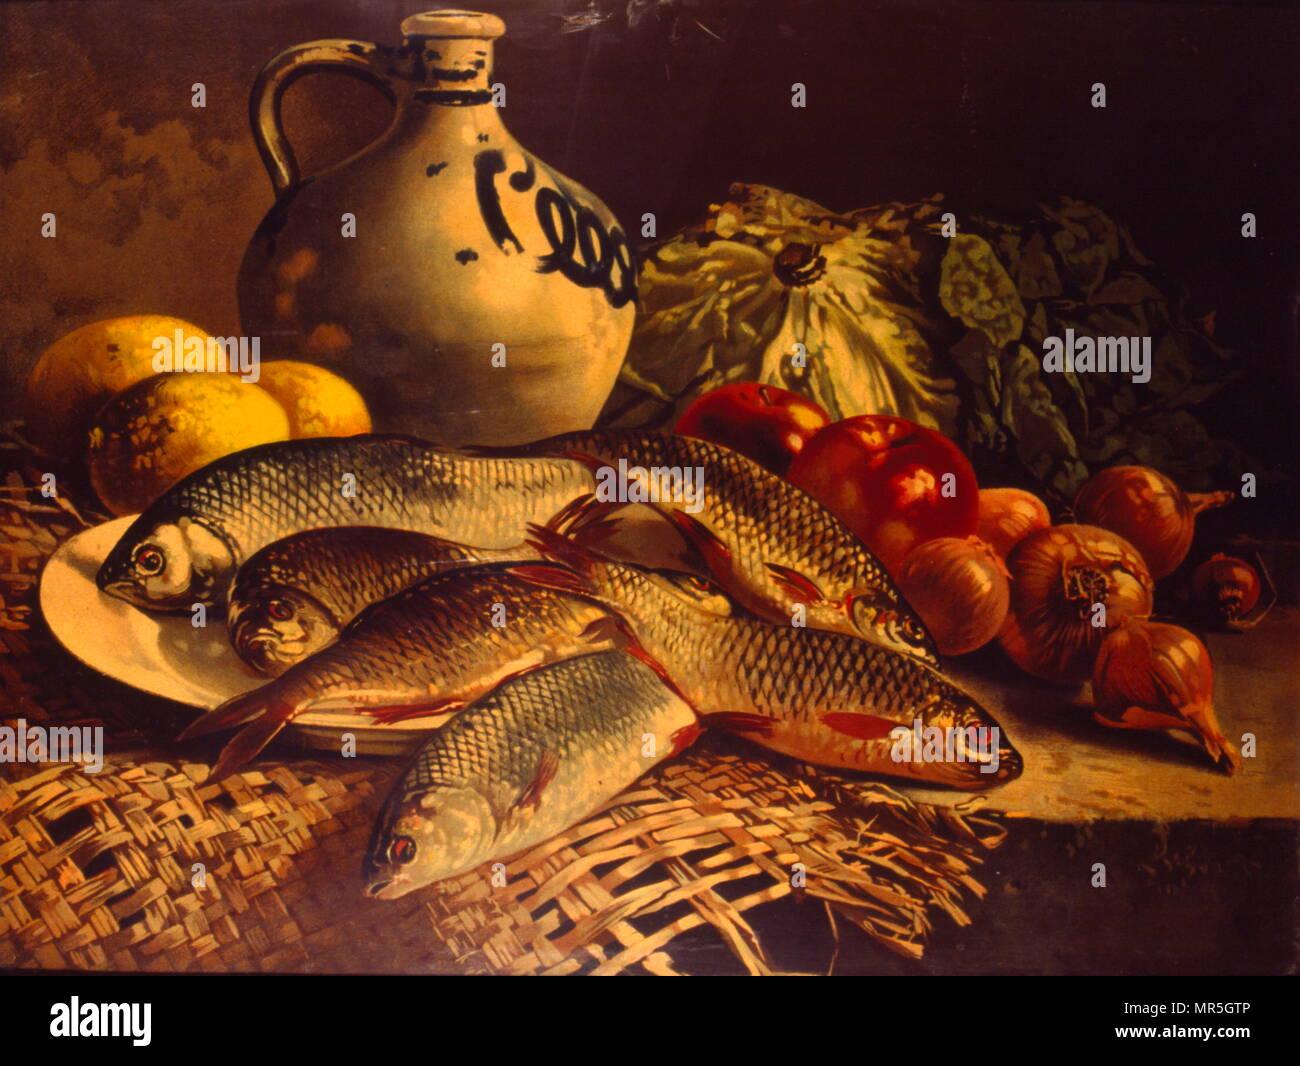 19e siècle français still life peinture. Vers 1870 Photo Stock